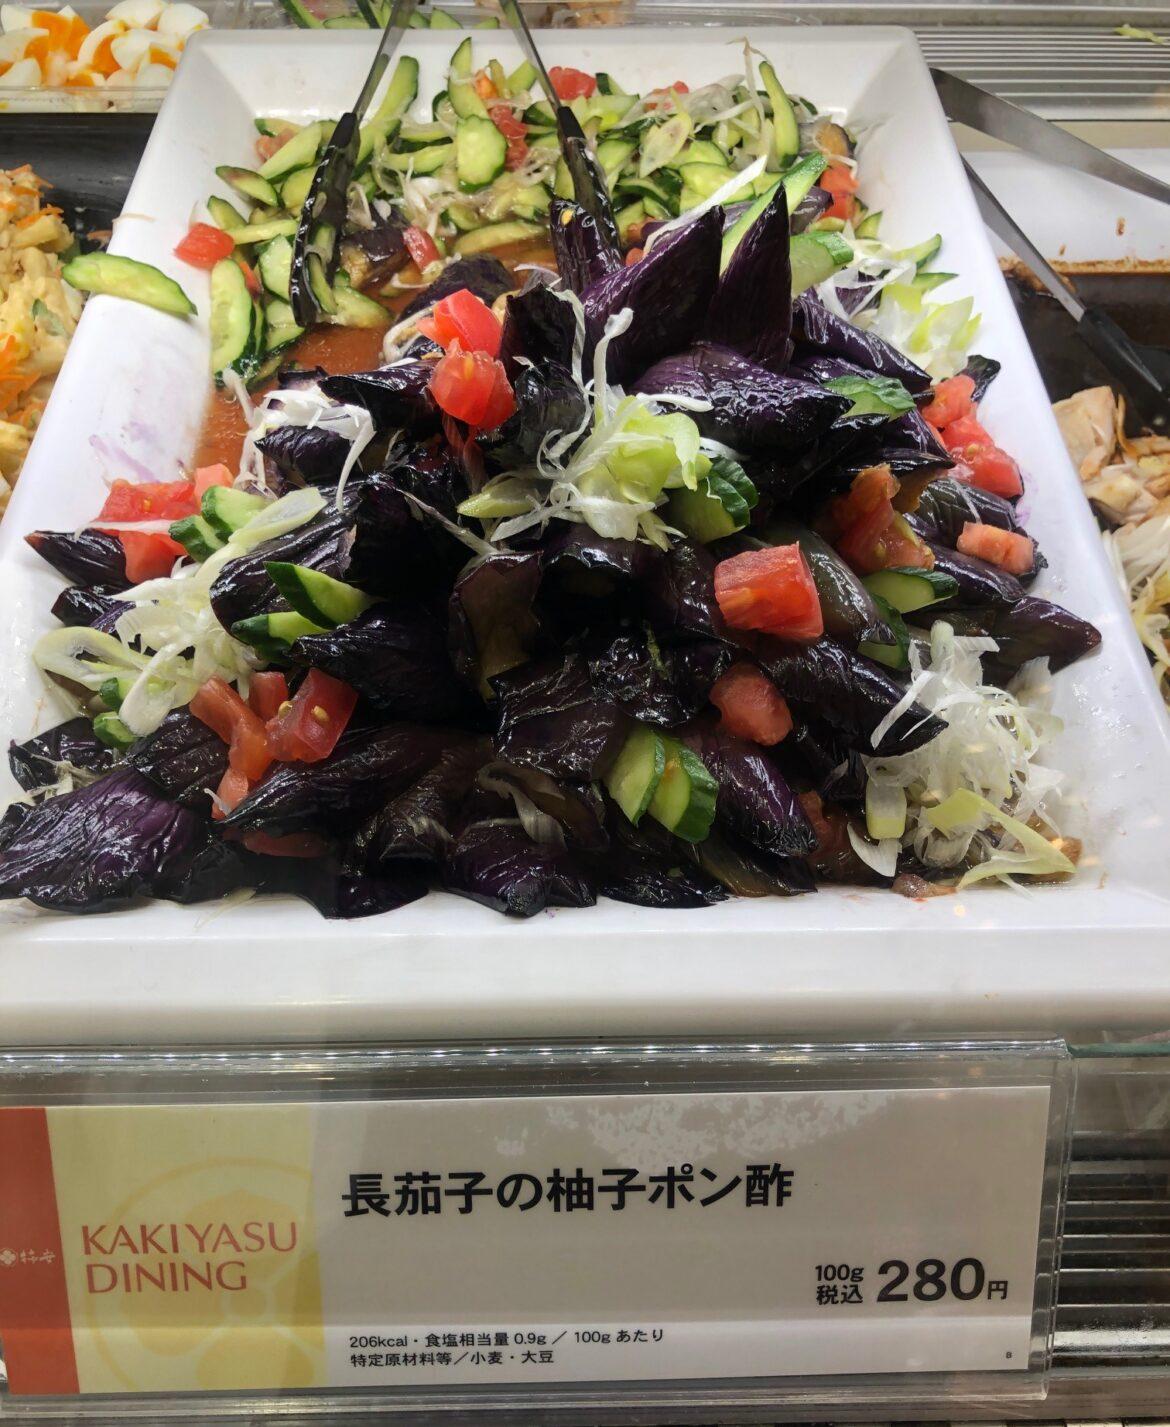 Eggplant dish 30: Eggplant salad (Japanese style)